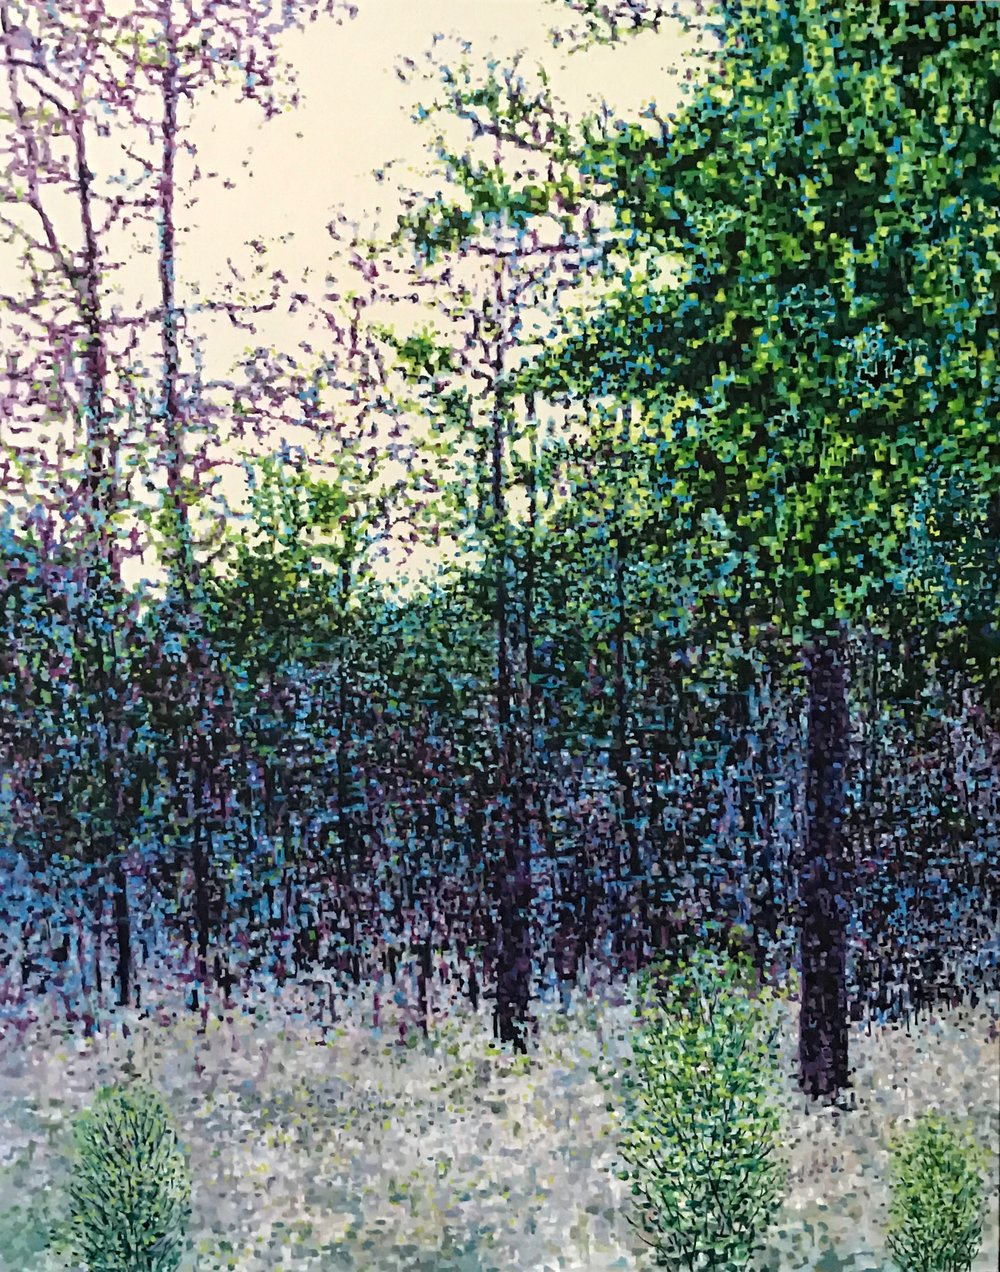 "Digital Forest, Oil on Linen, 26.5"" x 33.5"", 2017"